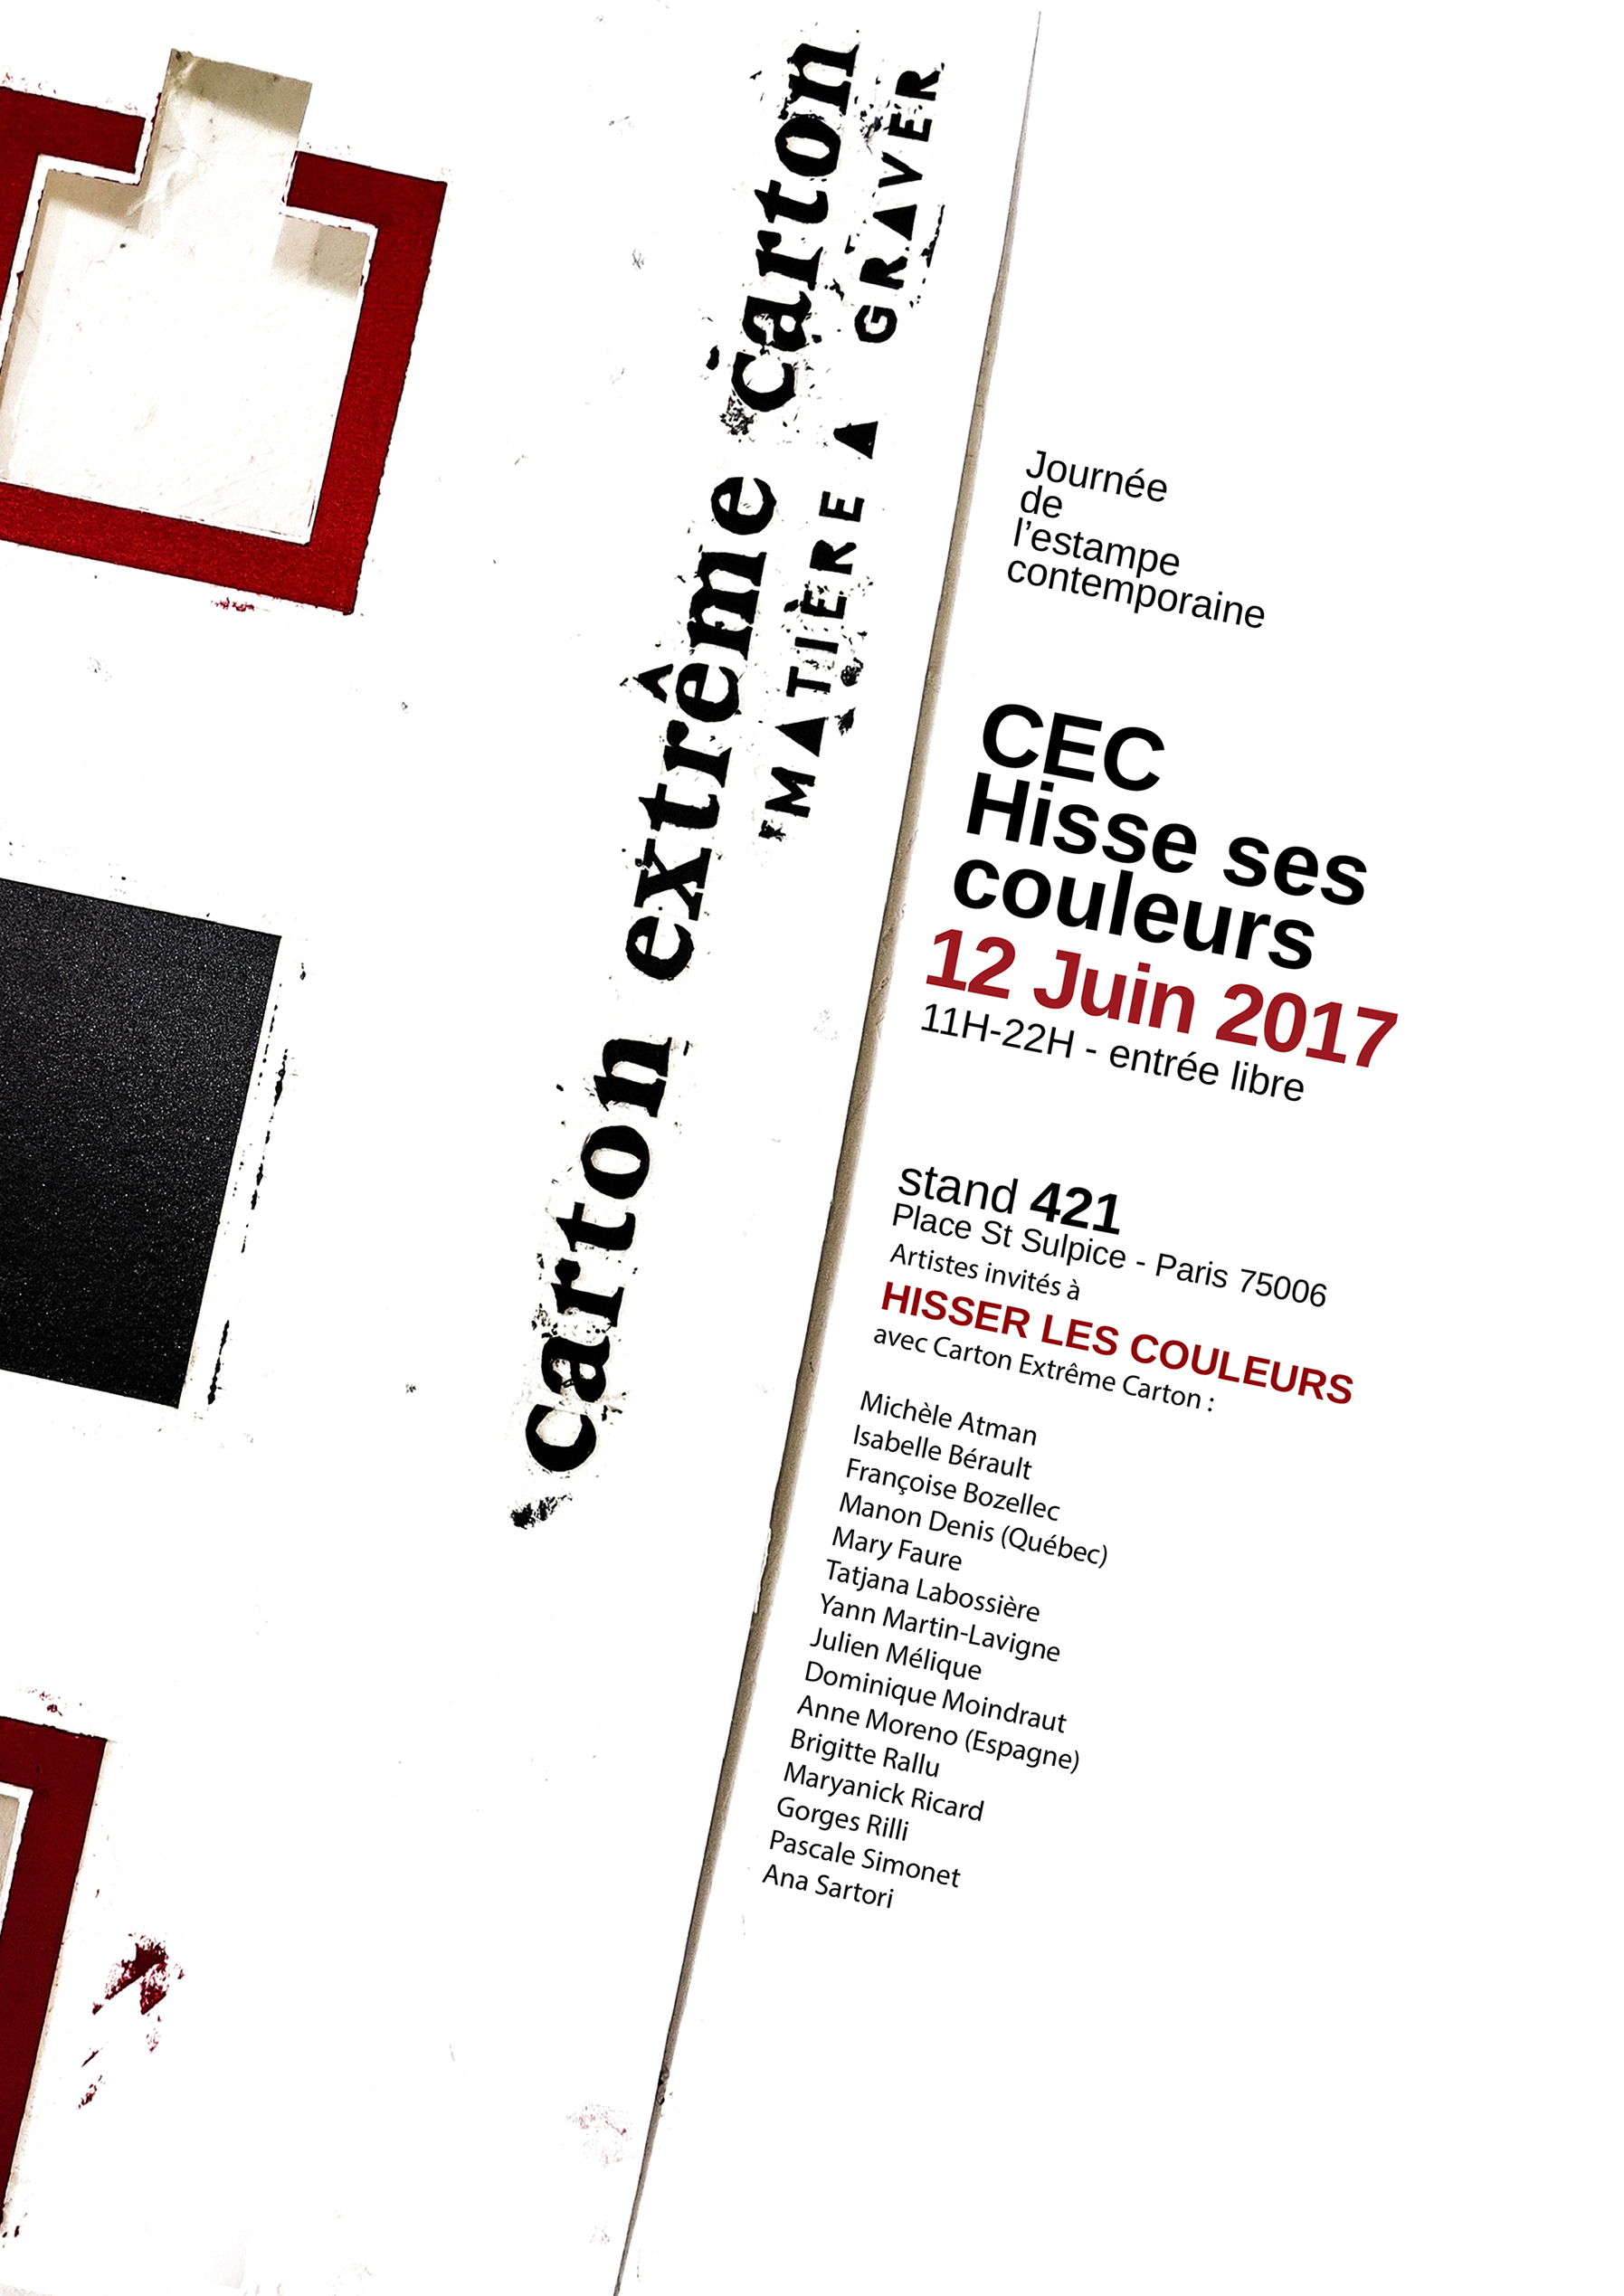 Visuel st sulpice CEC 2017.jpg